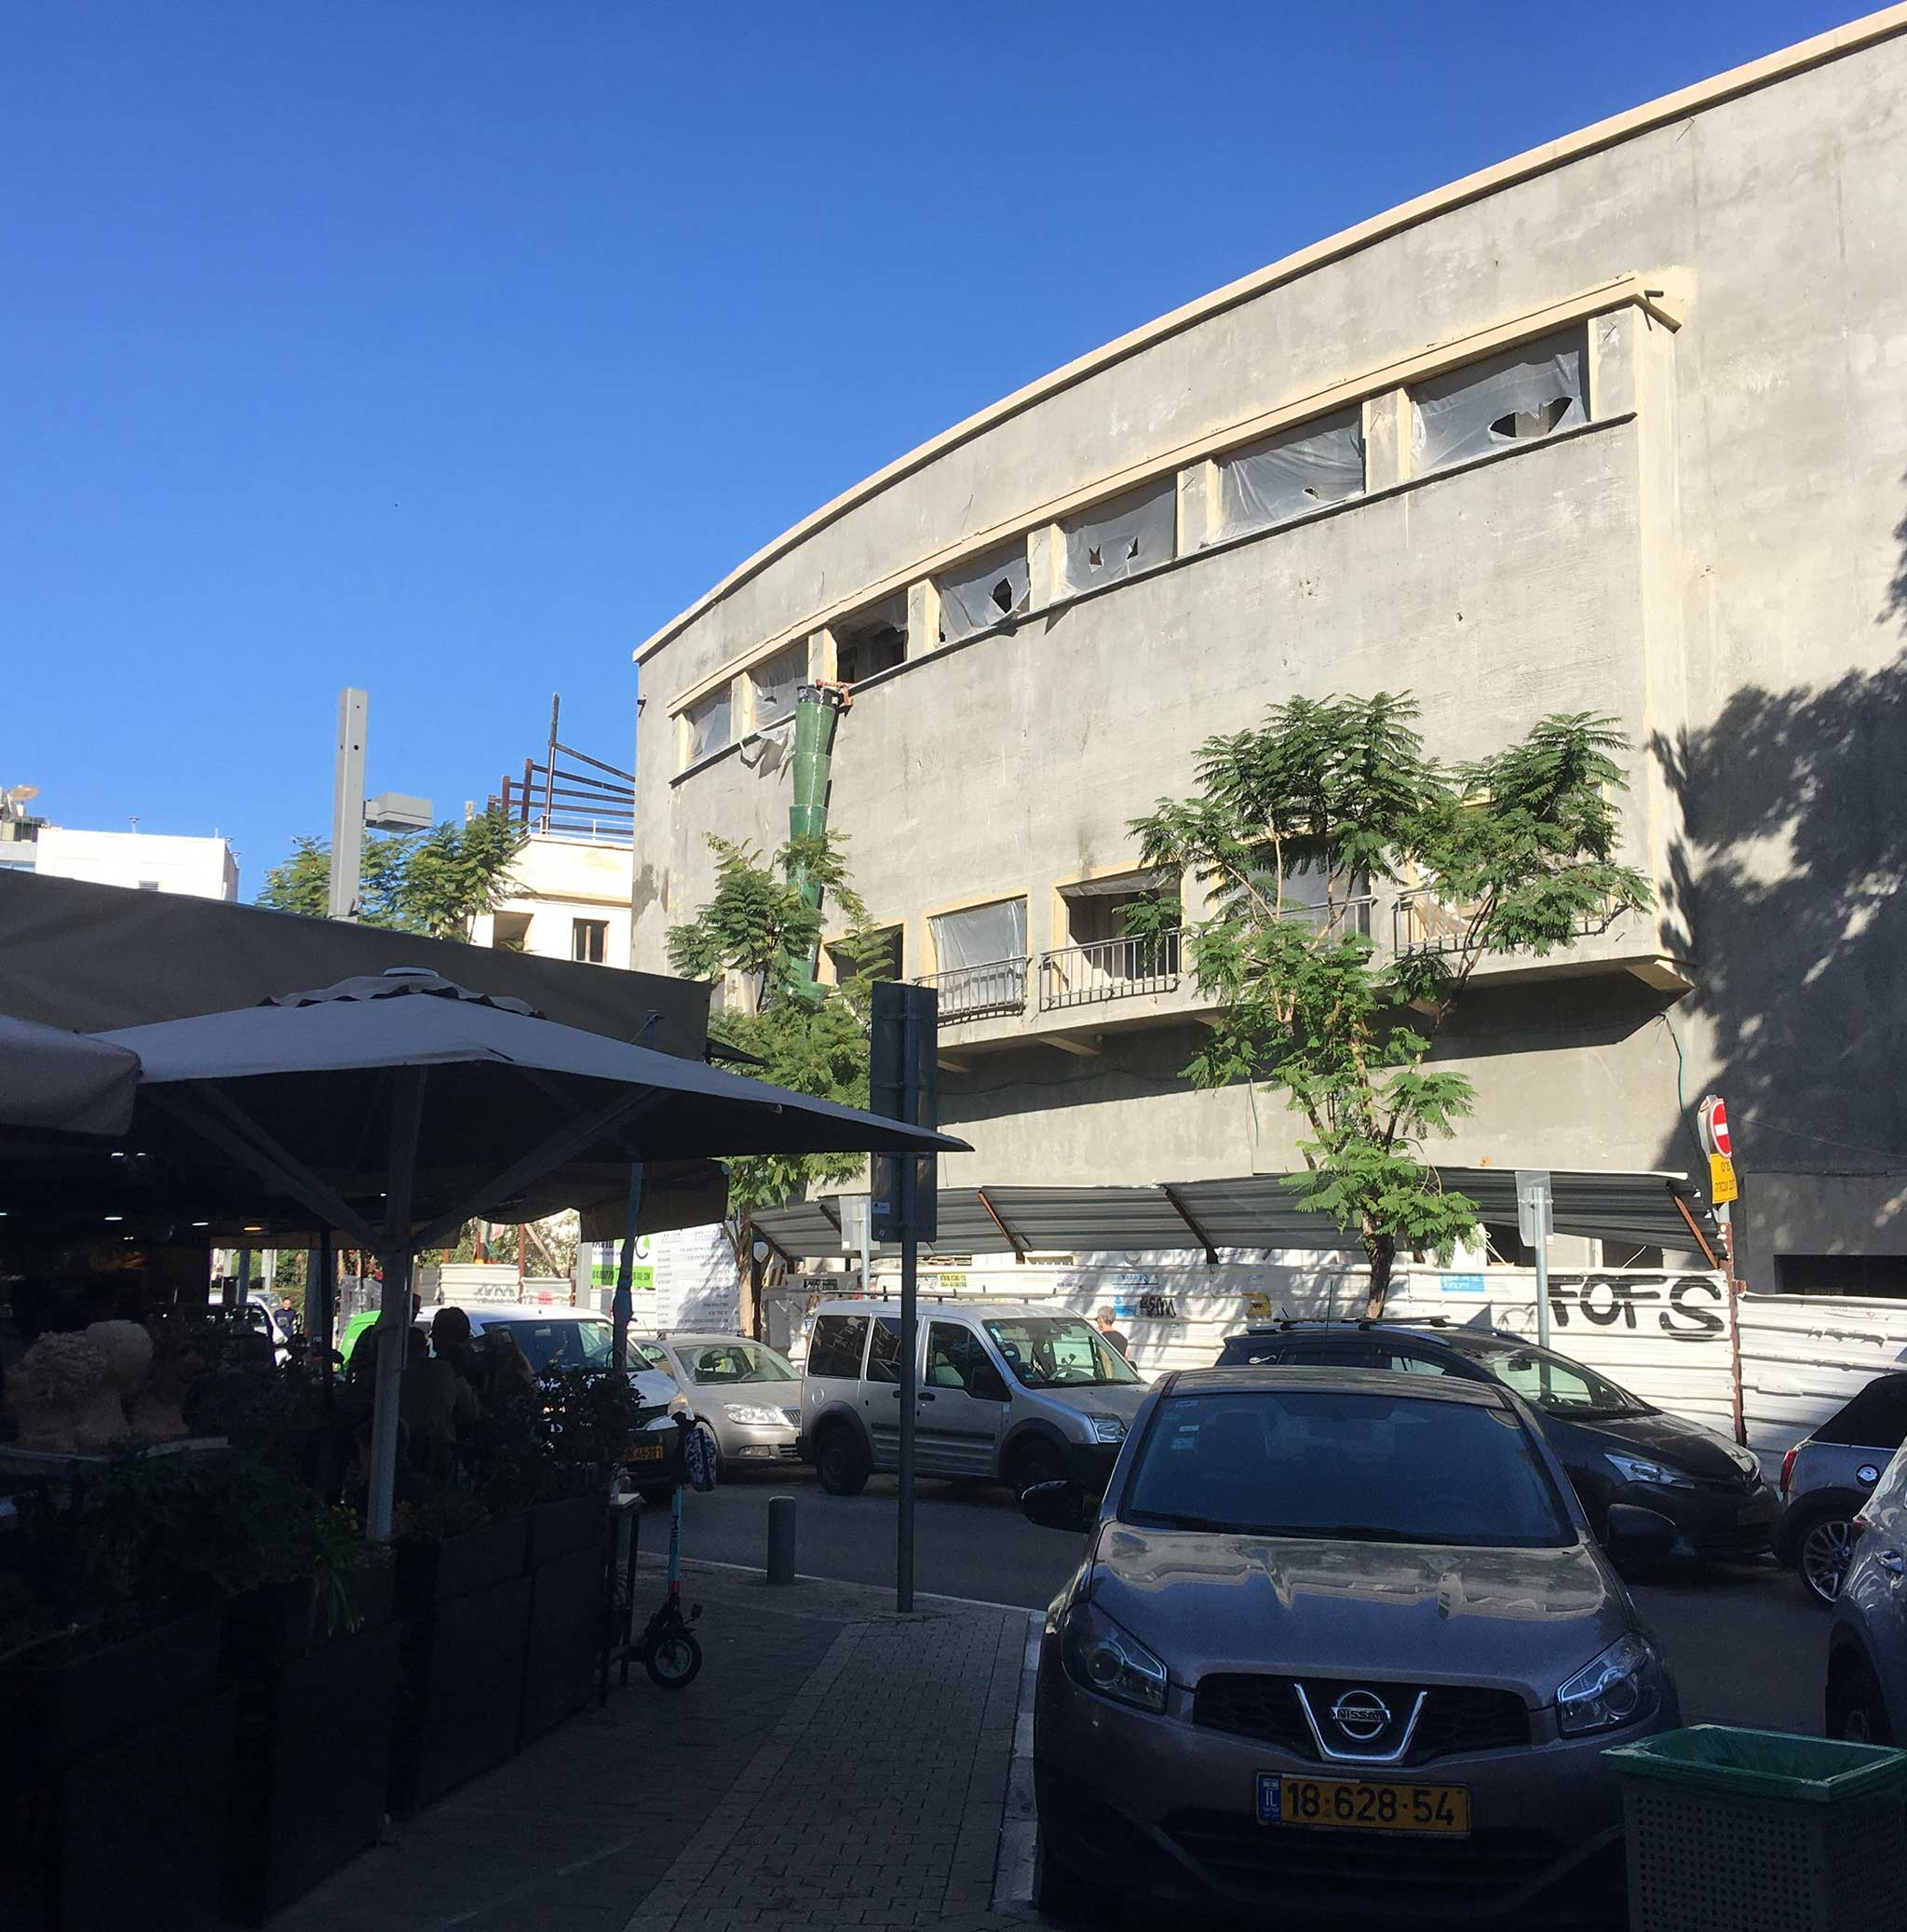 Ohel Theatre on Tel Aviv audio tour The White City